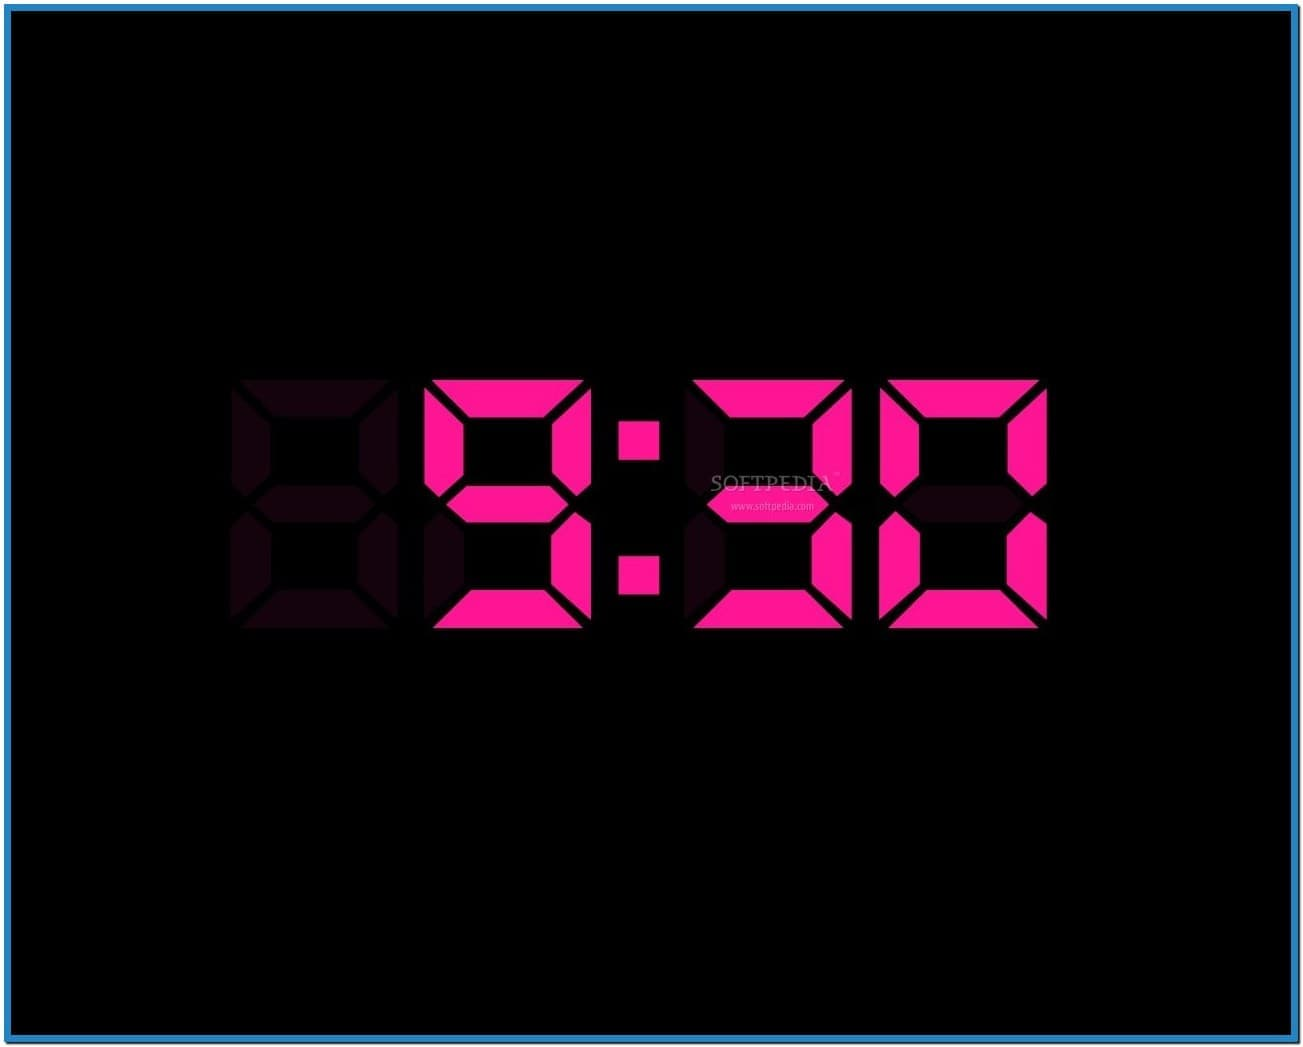 Free desktop clock download.